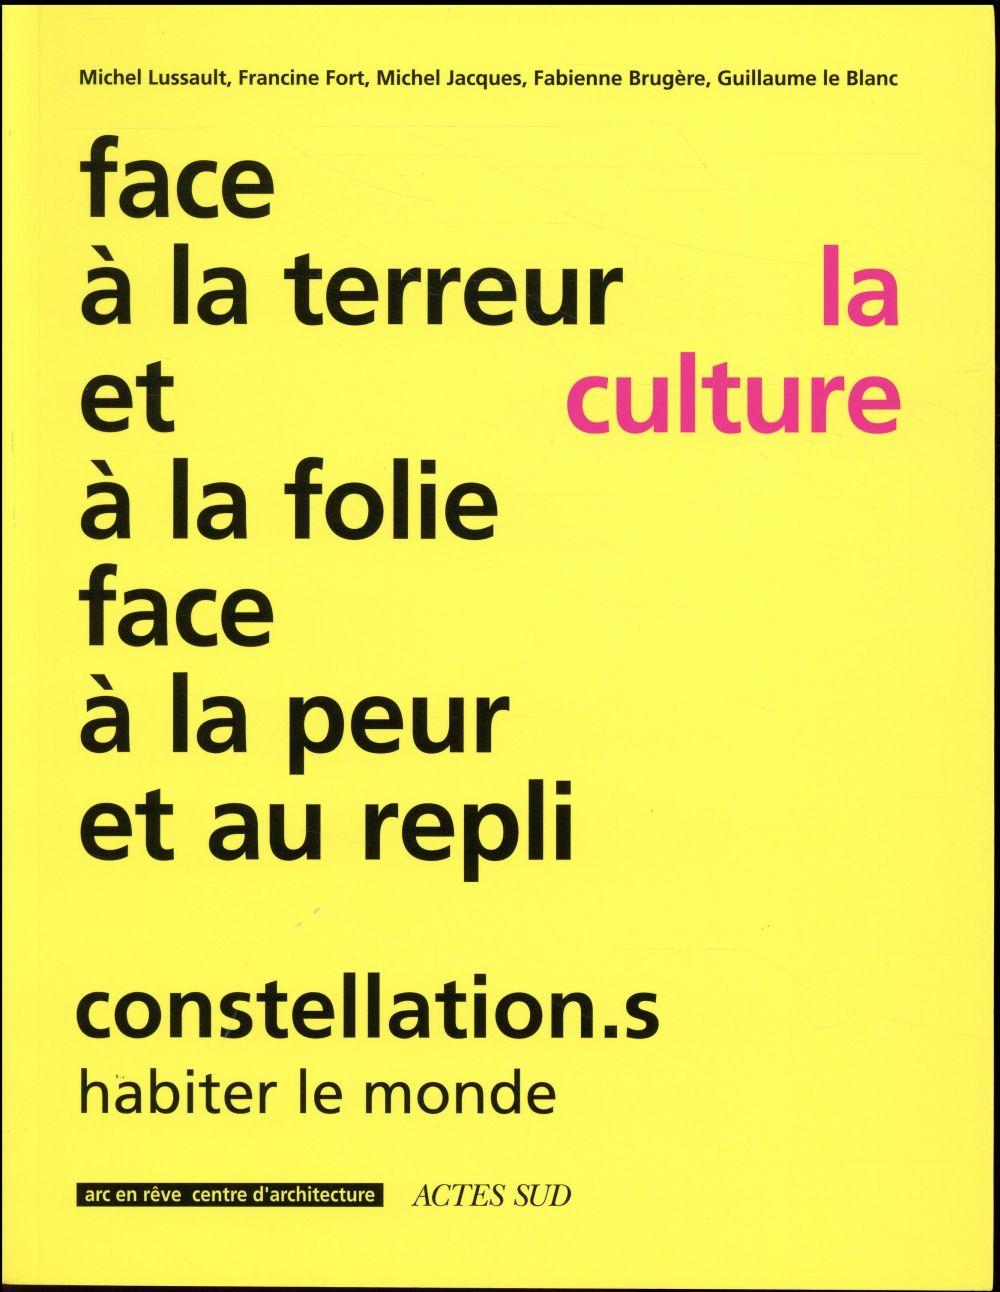 CONSTELLATION.S  -  HABITER LE MONDE